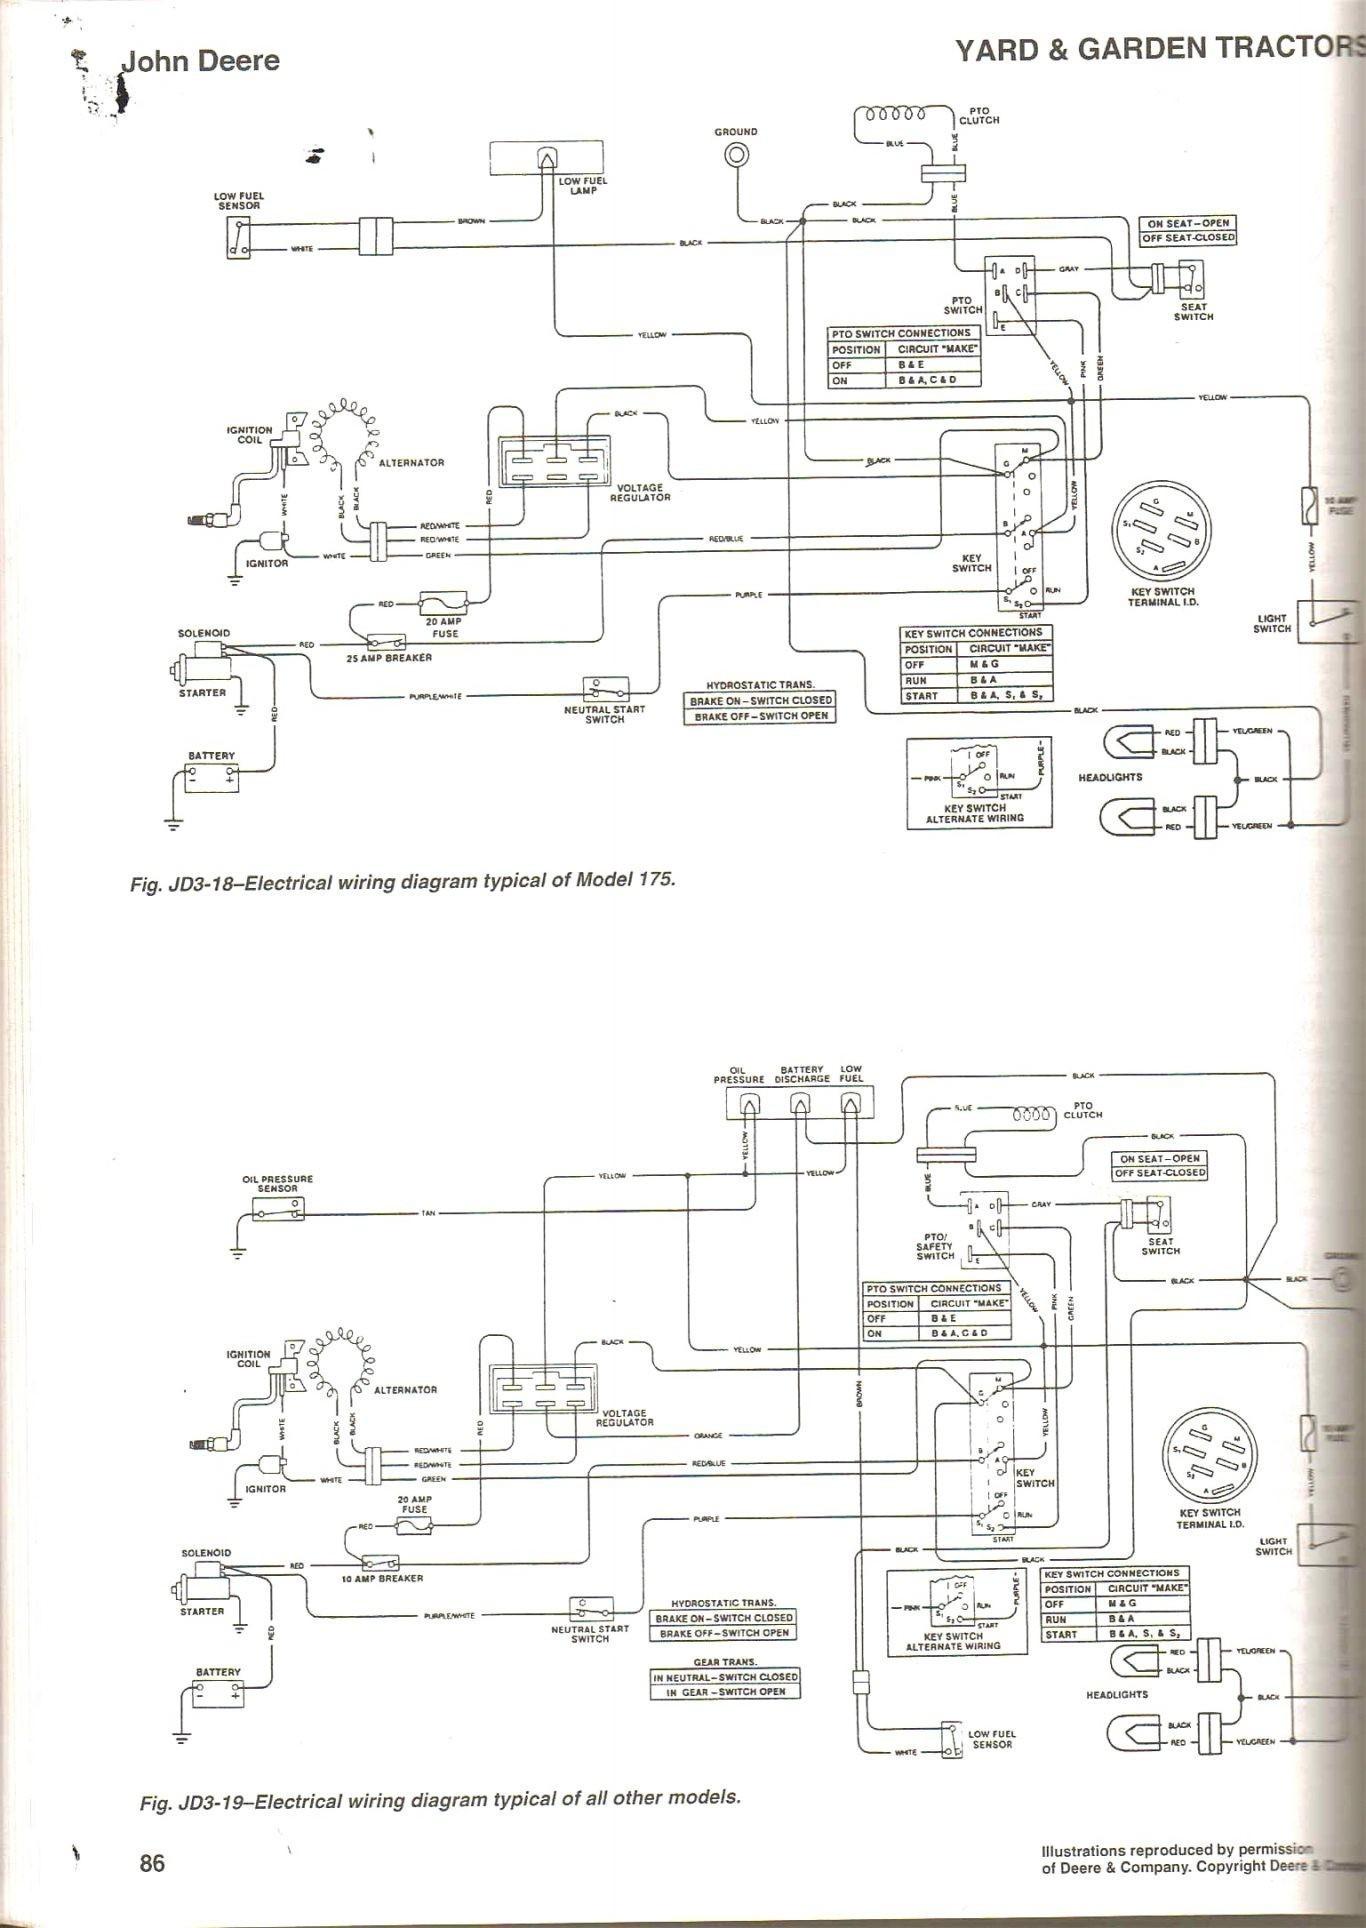 Dodge ram wiring diagram elegant dodge ram trailer wiring diagram new dodge  ram of dodge ram